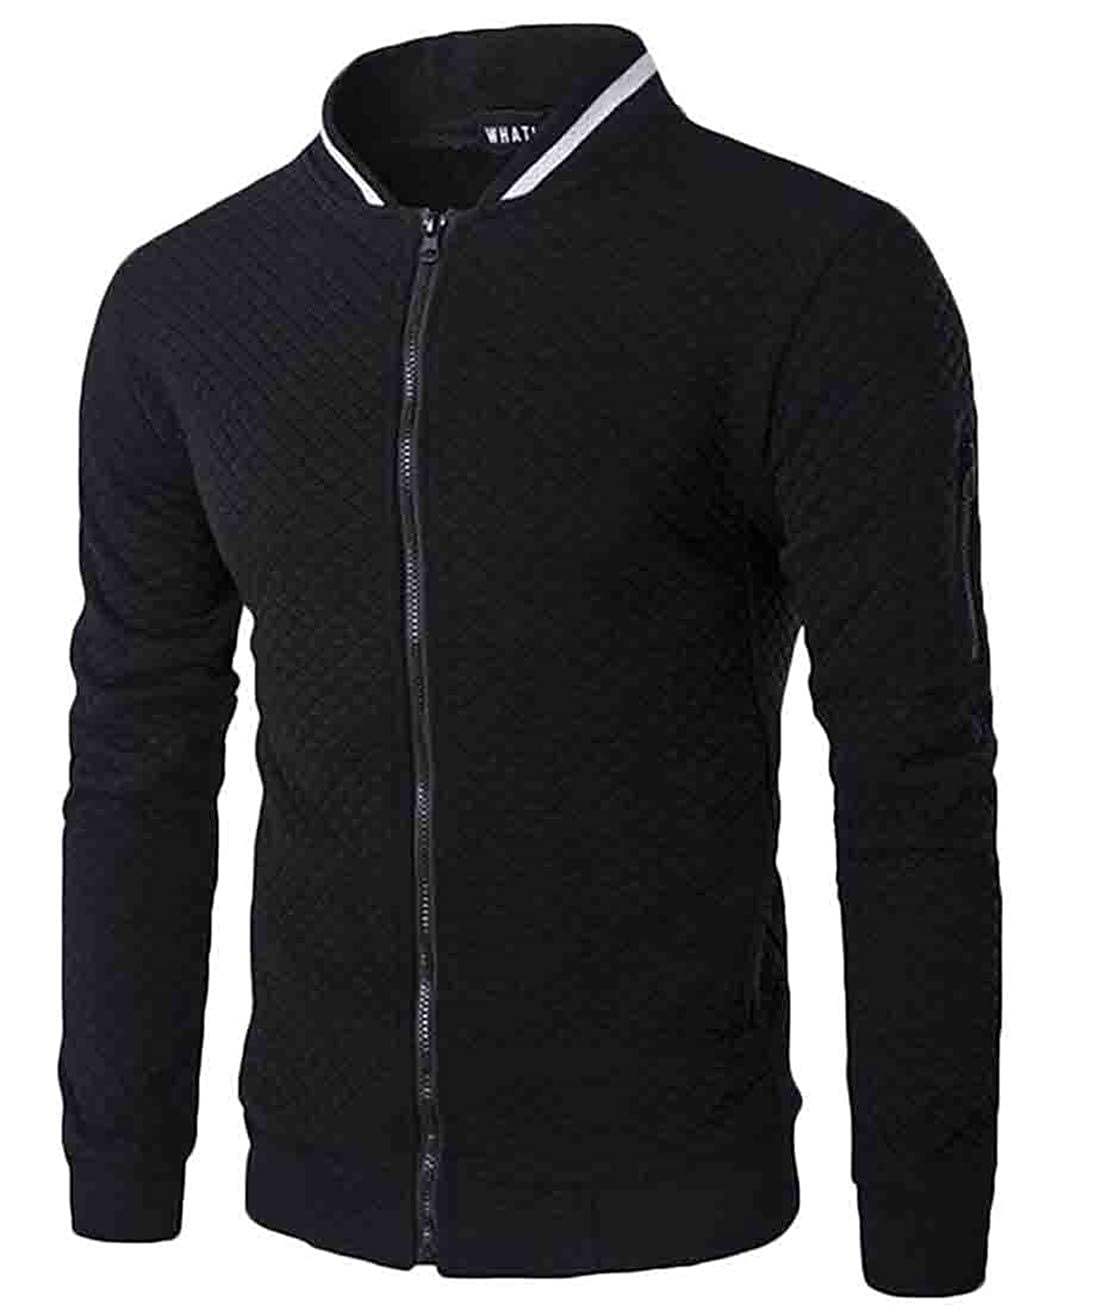 VaeJY Mens Turtleneck Pullover Velvet Fleece Loose Fit Sweatshirt